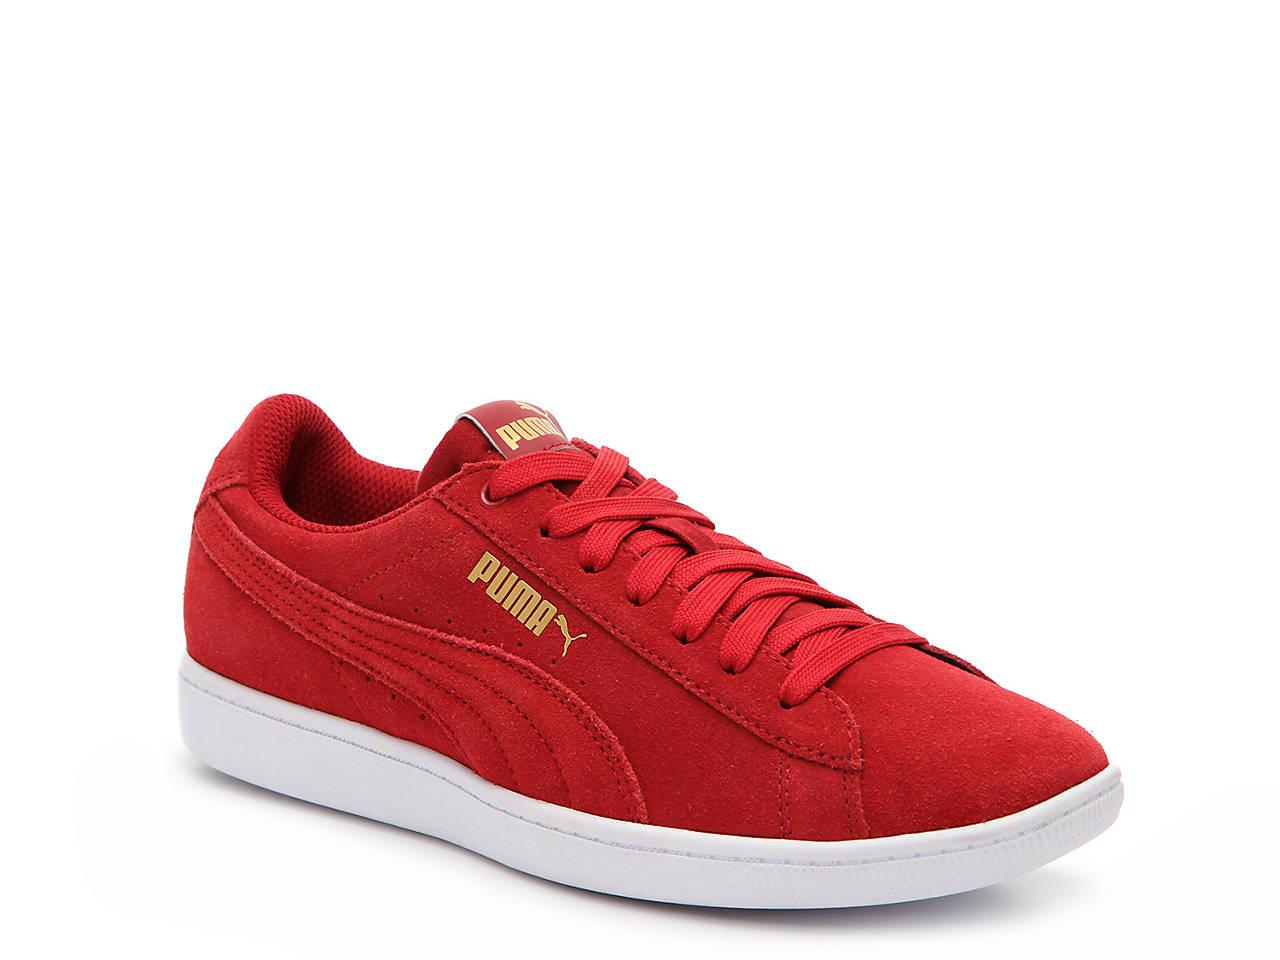 66213ef6339c Puma Vikky Lo Suede Sneaker - Women s Women s Shoes